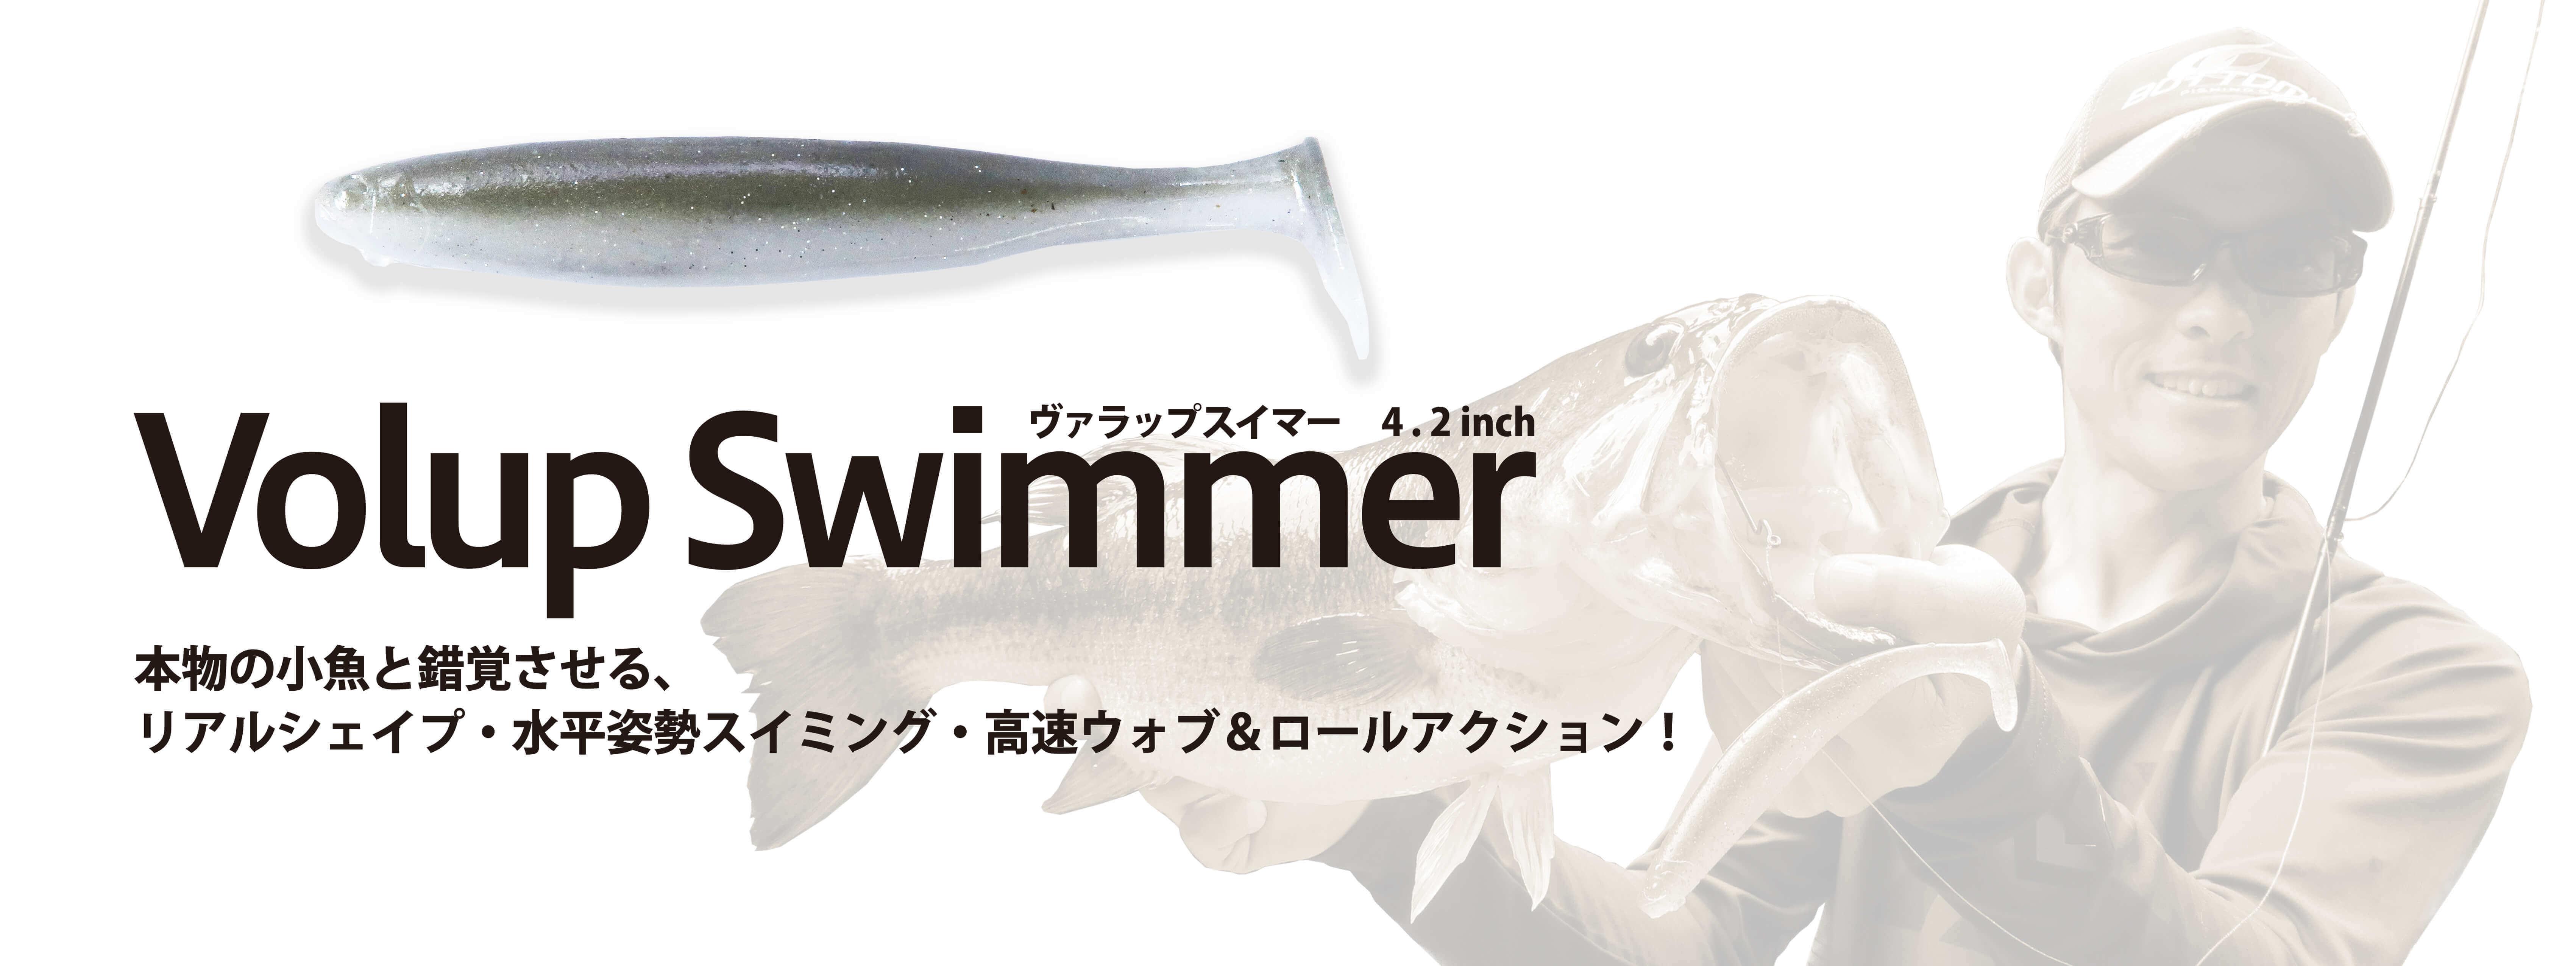 Volup Swimmer